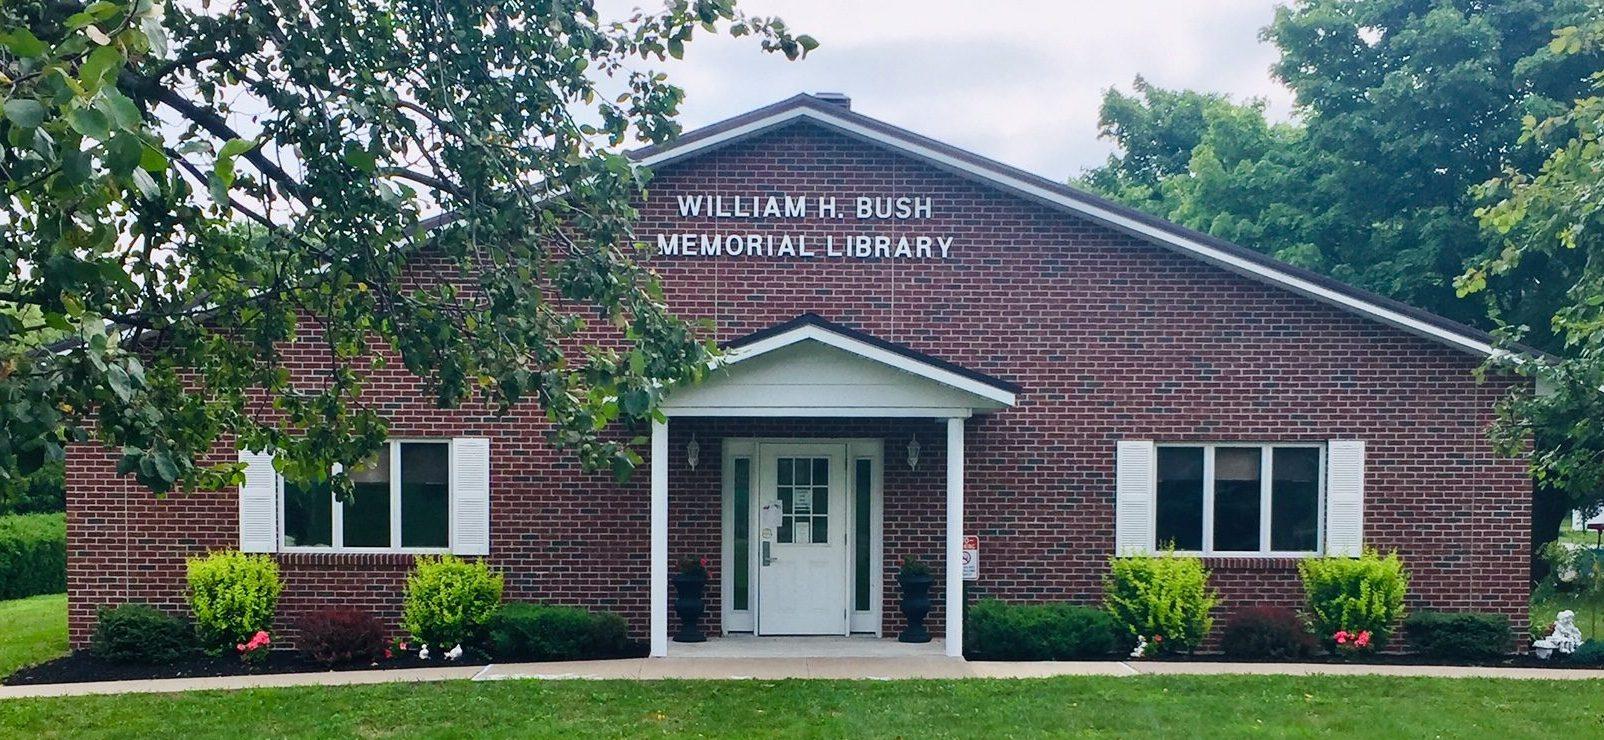 William H. Bush Memorial Library